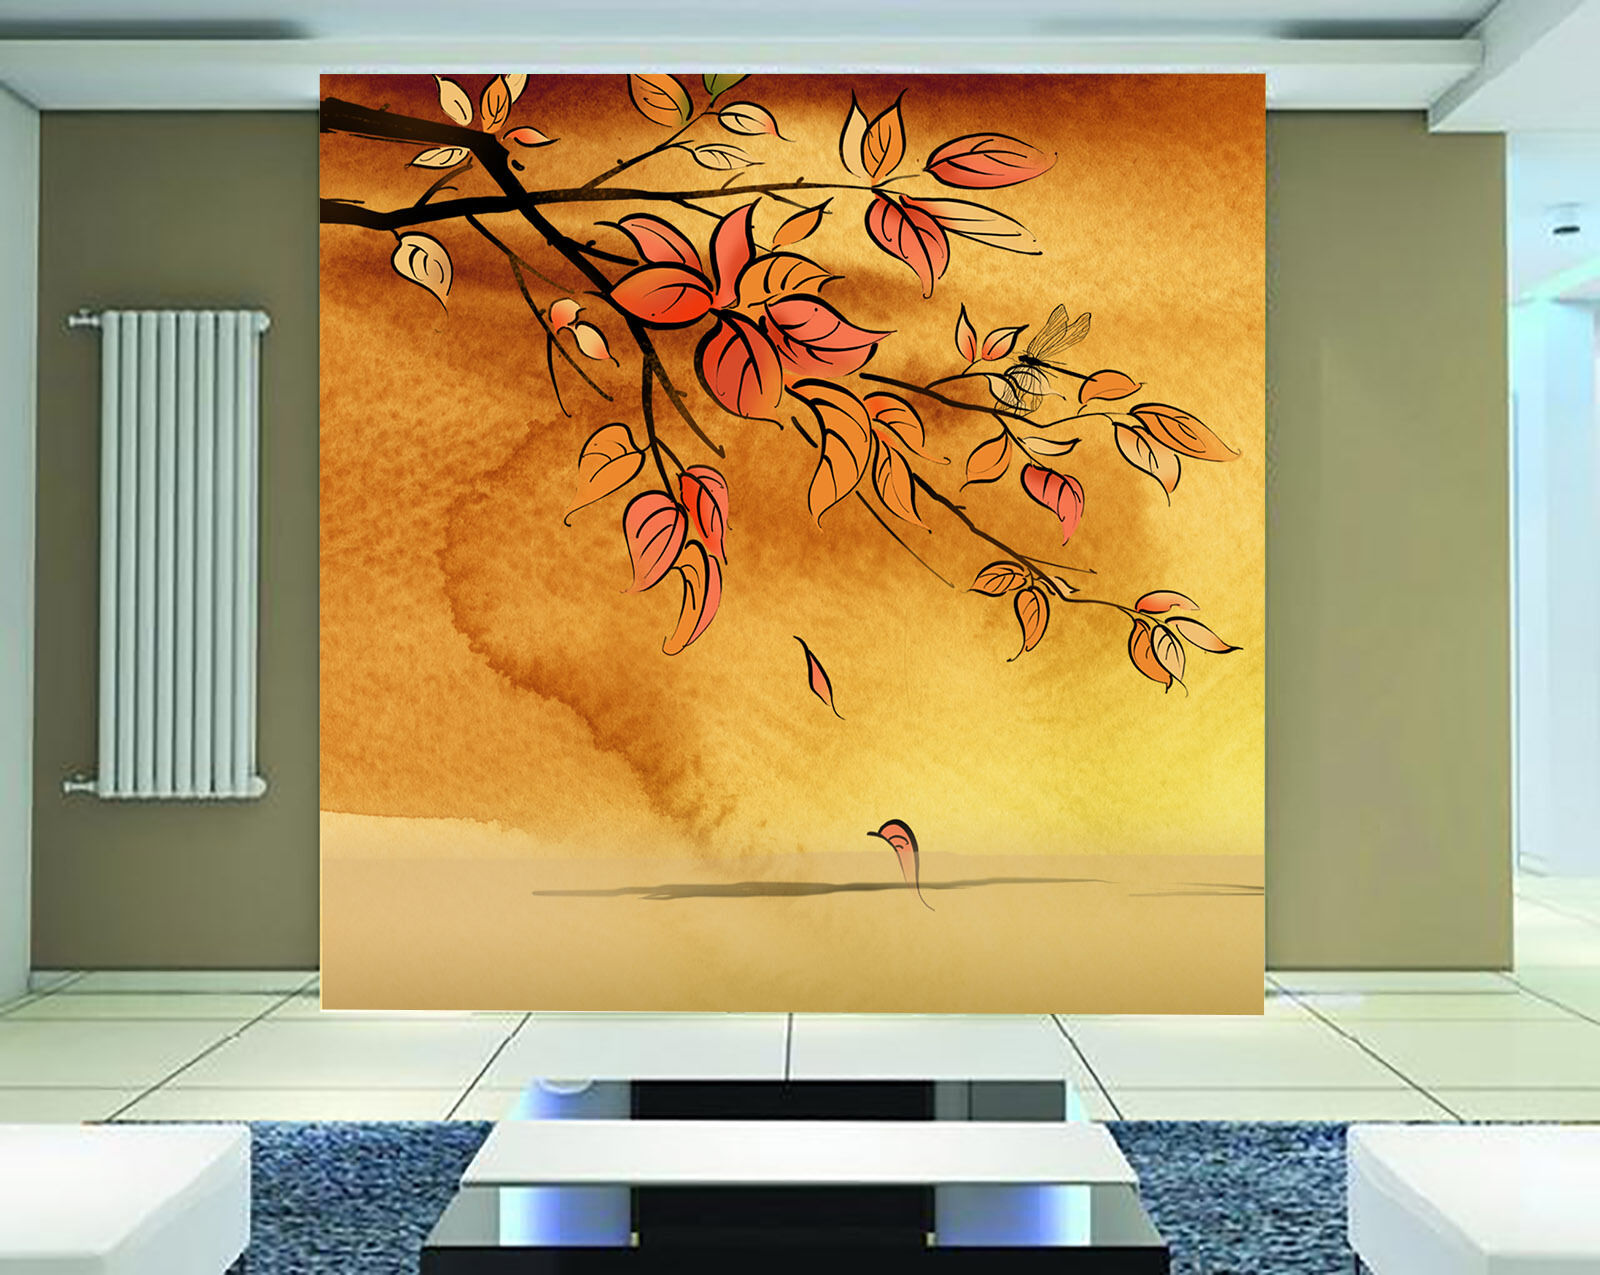 3D Gelbe Blätter 86278 Fototapeten Wandbild Fototapete BildTapete Familie DE